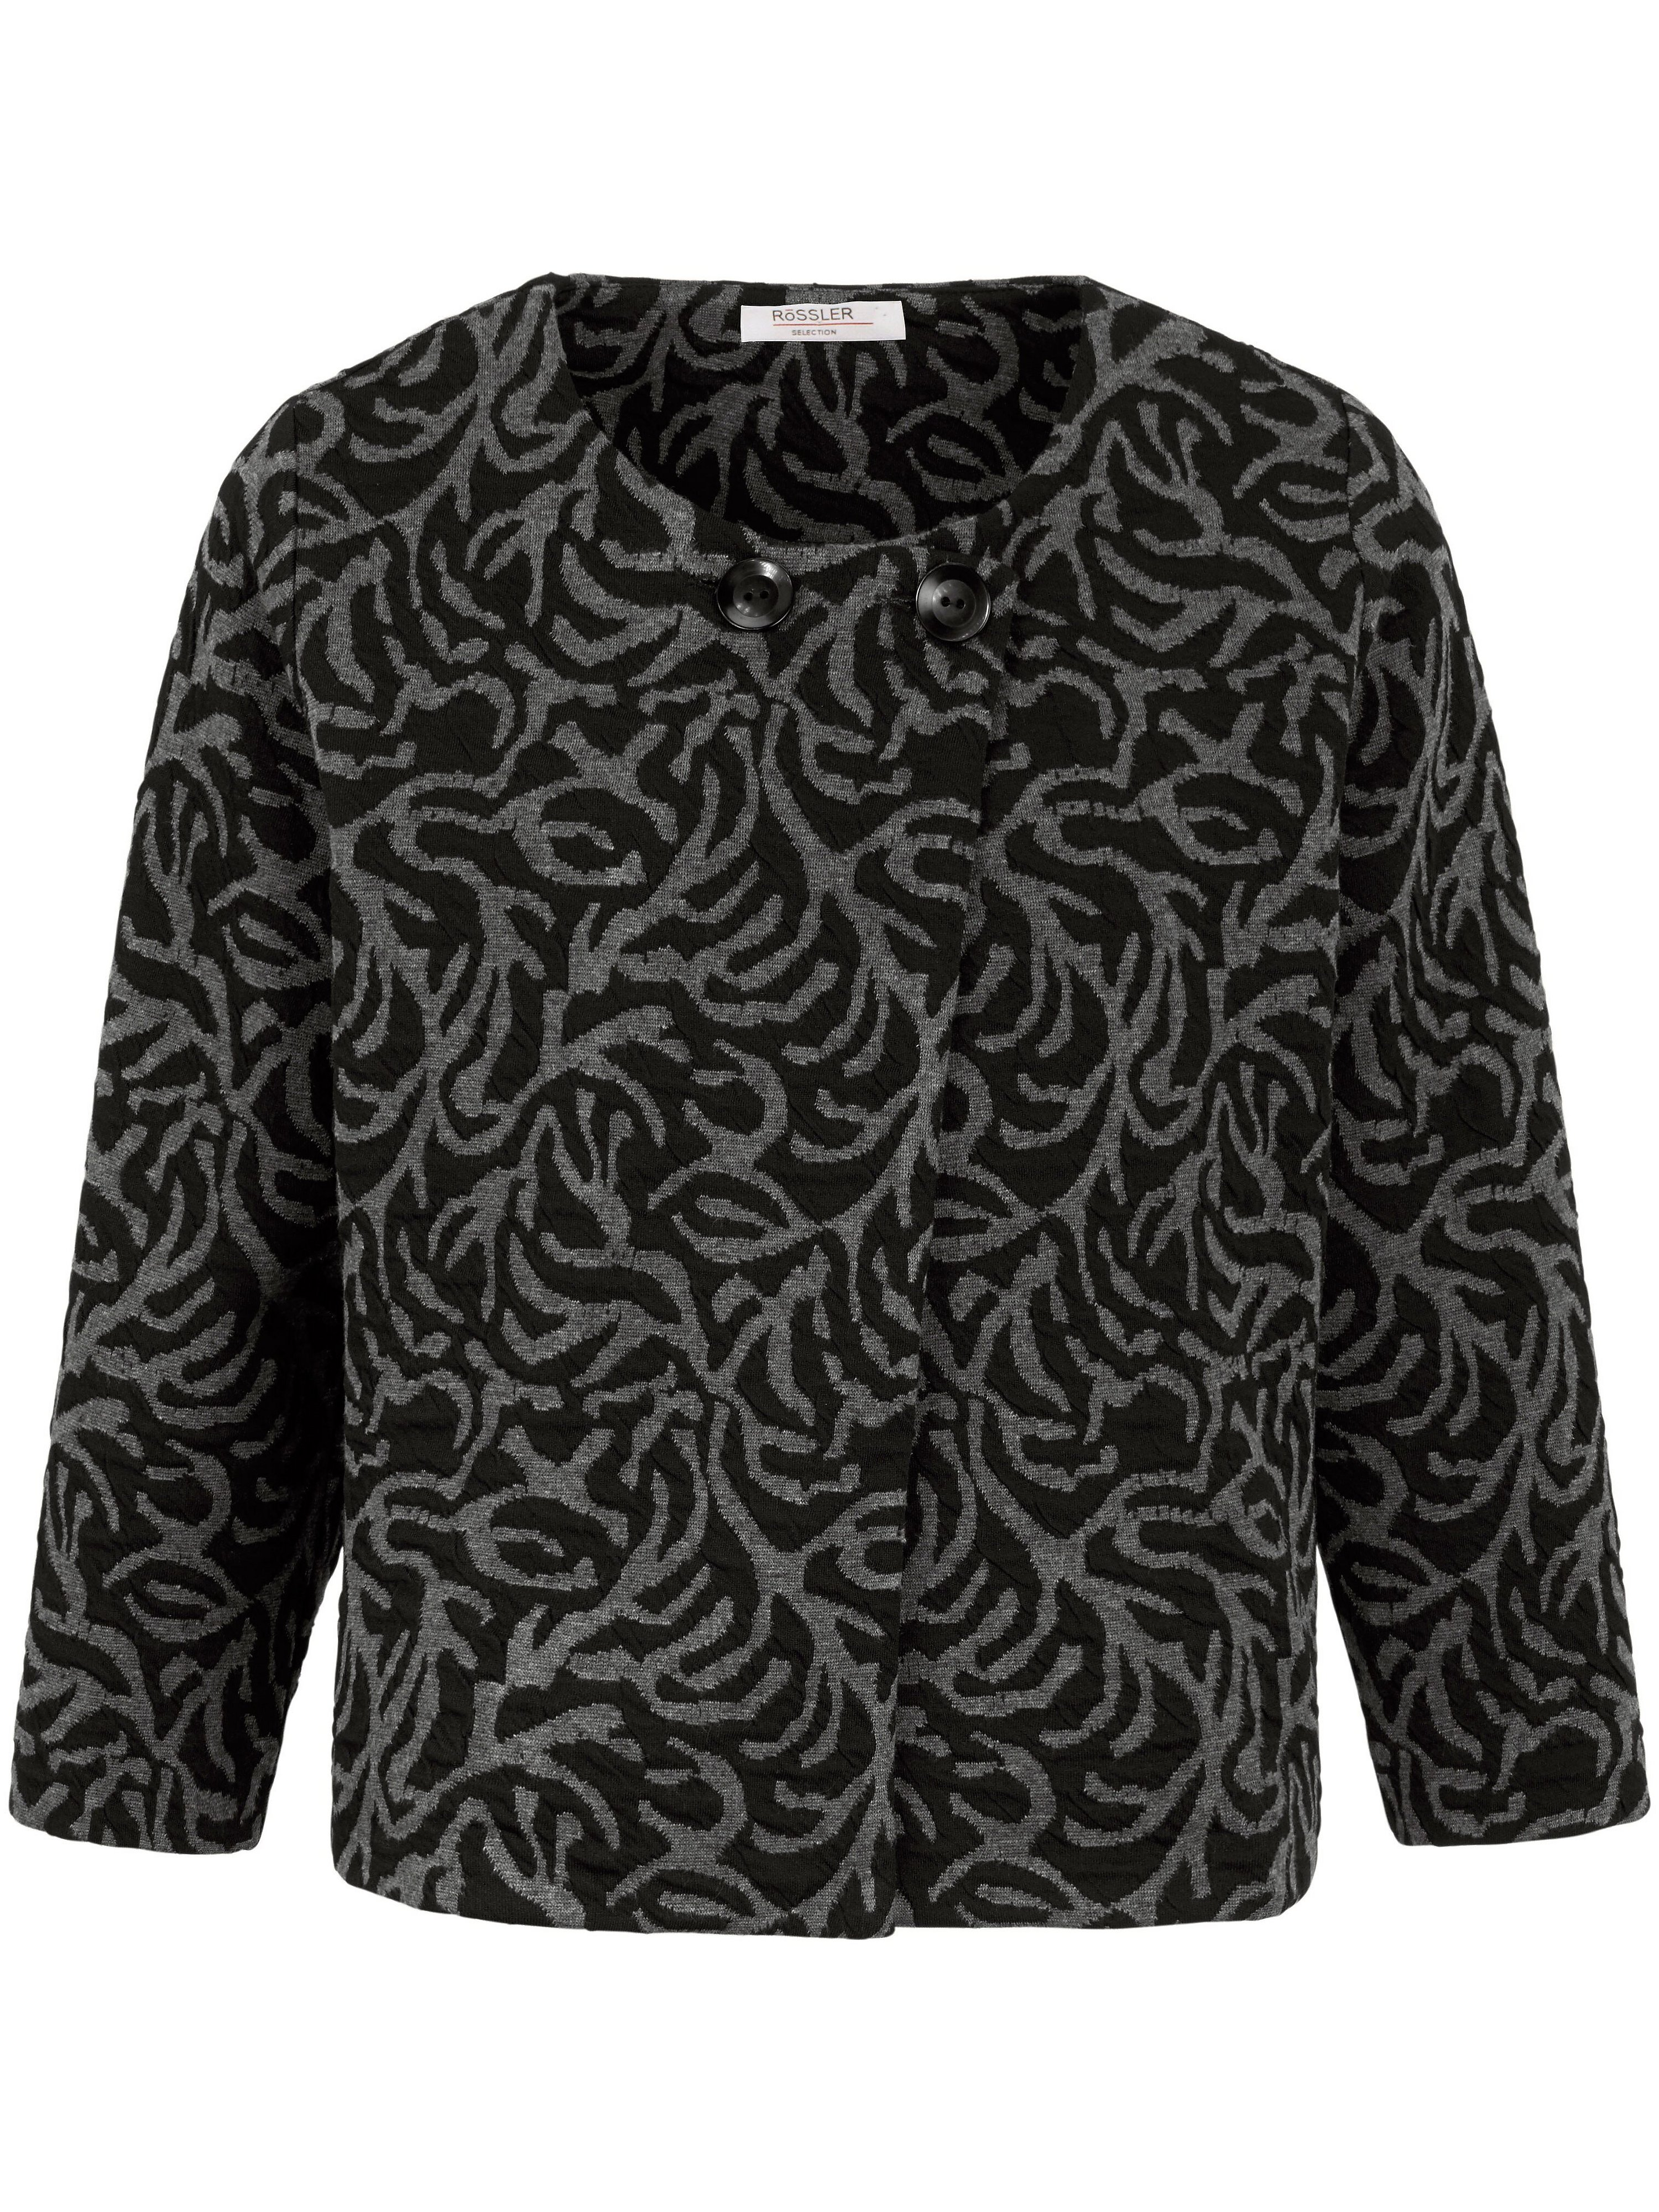 La veste courte  Rössler Selection noir taille 44